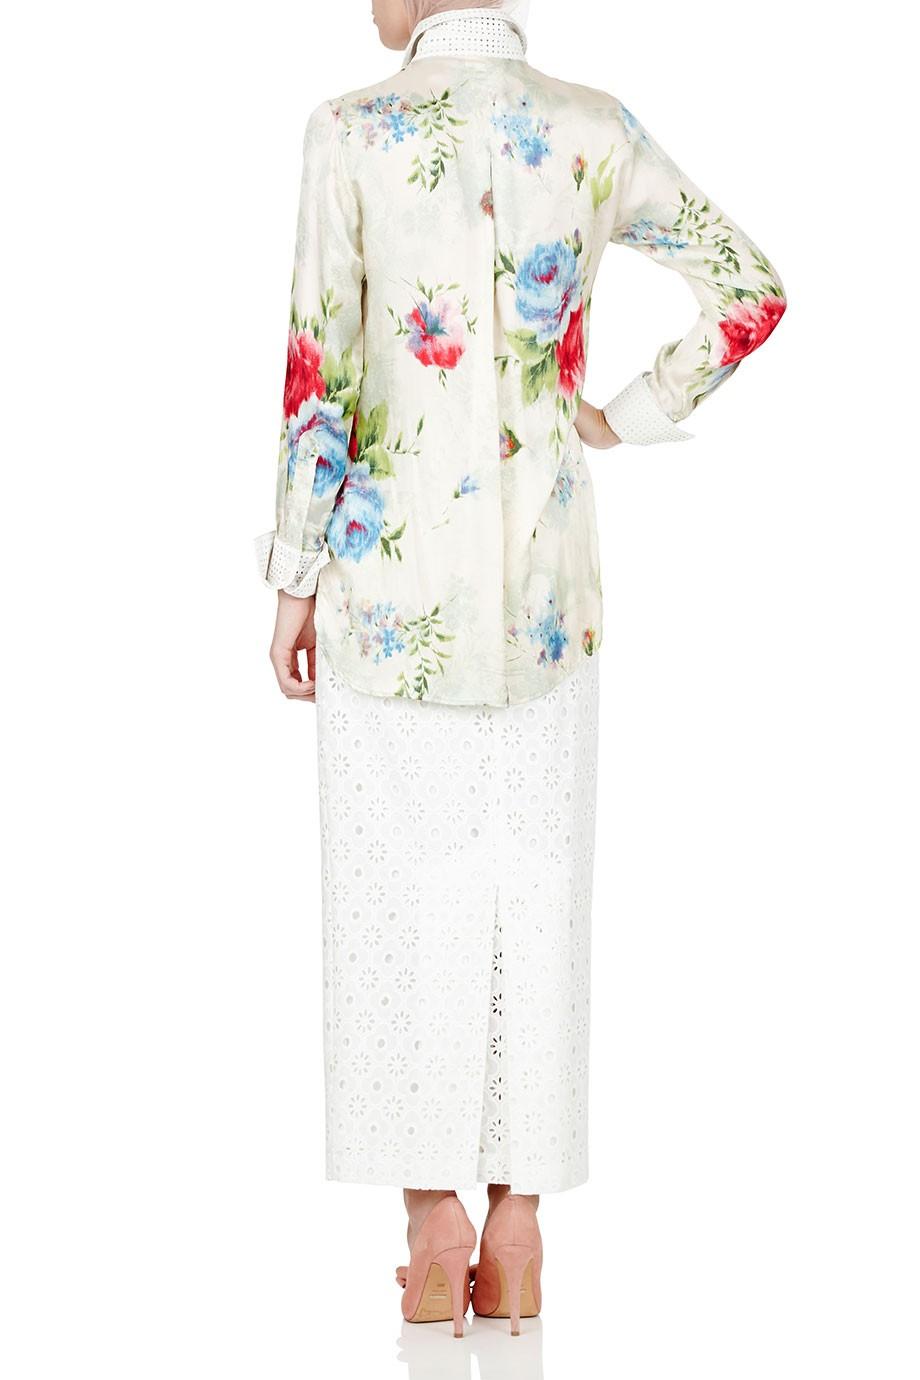 Diana-Kotb-Game-Maker-Shirt-Floral-Ruins-Skit-02